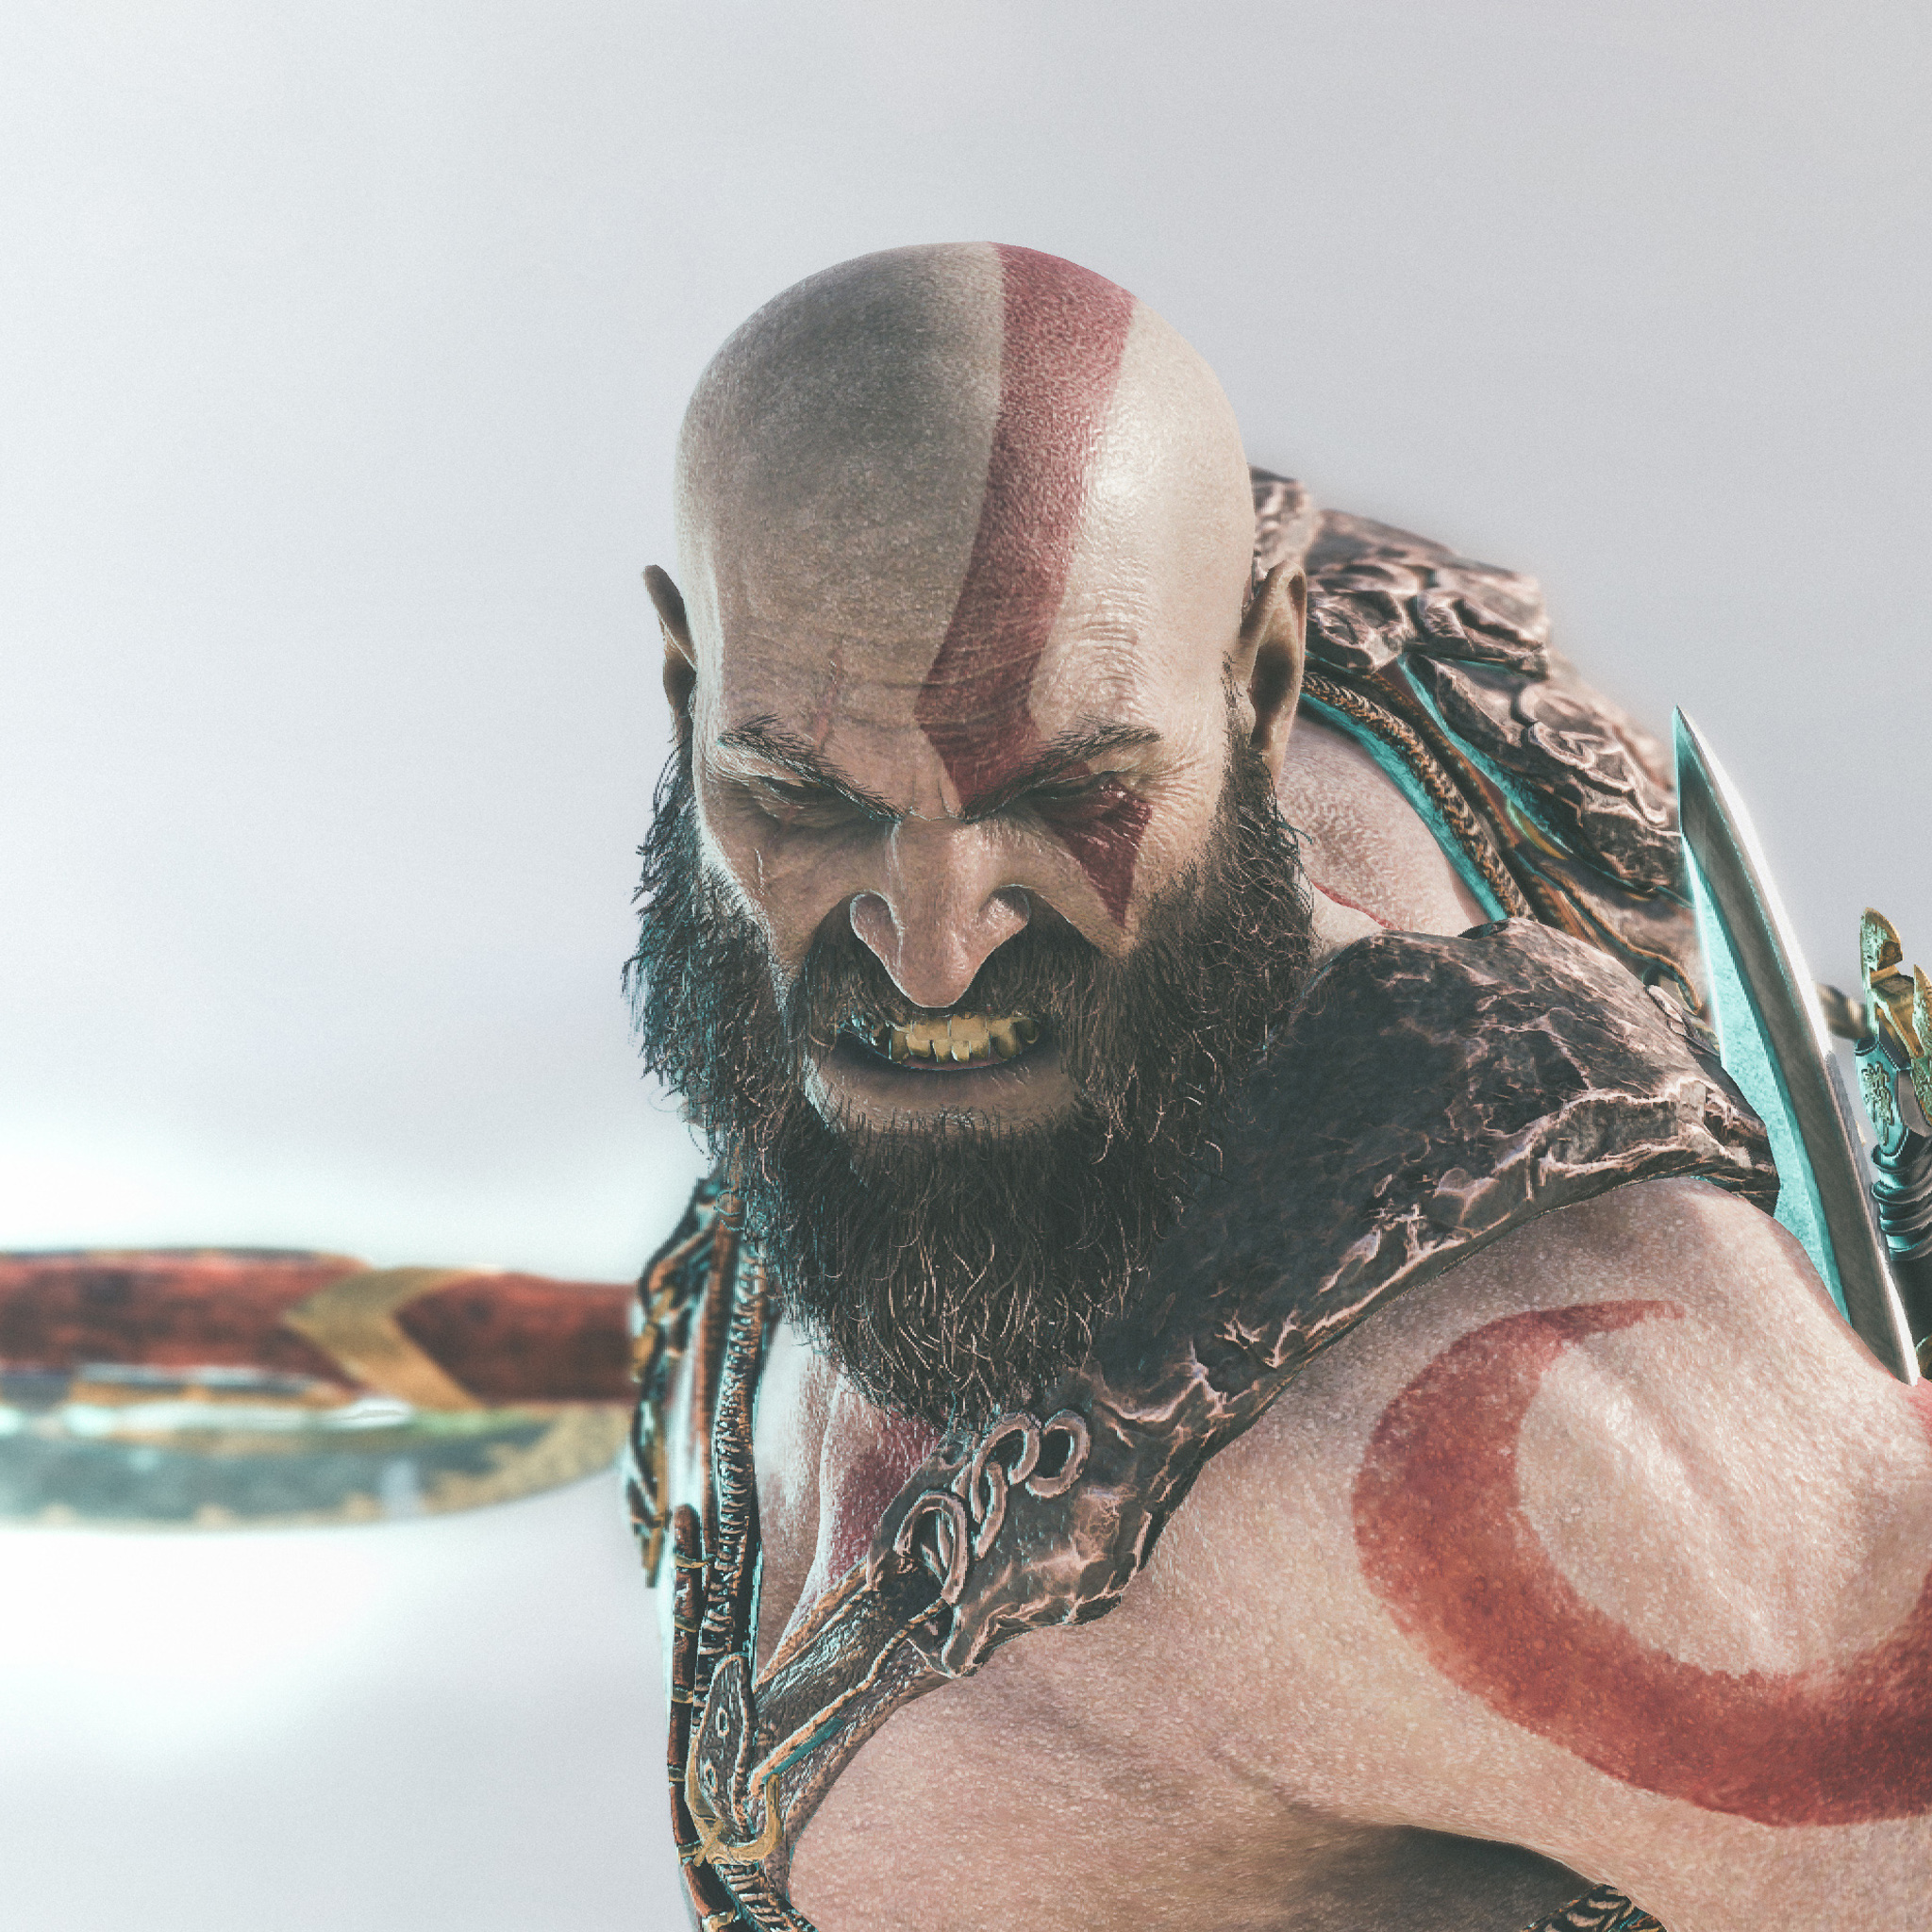 kratos-god-of-war-4k-2018-6y.jpg